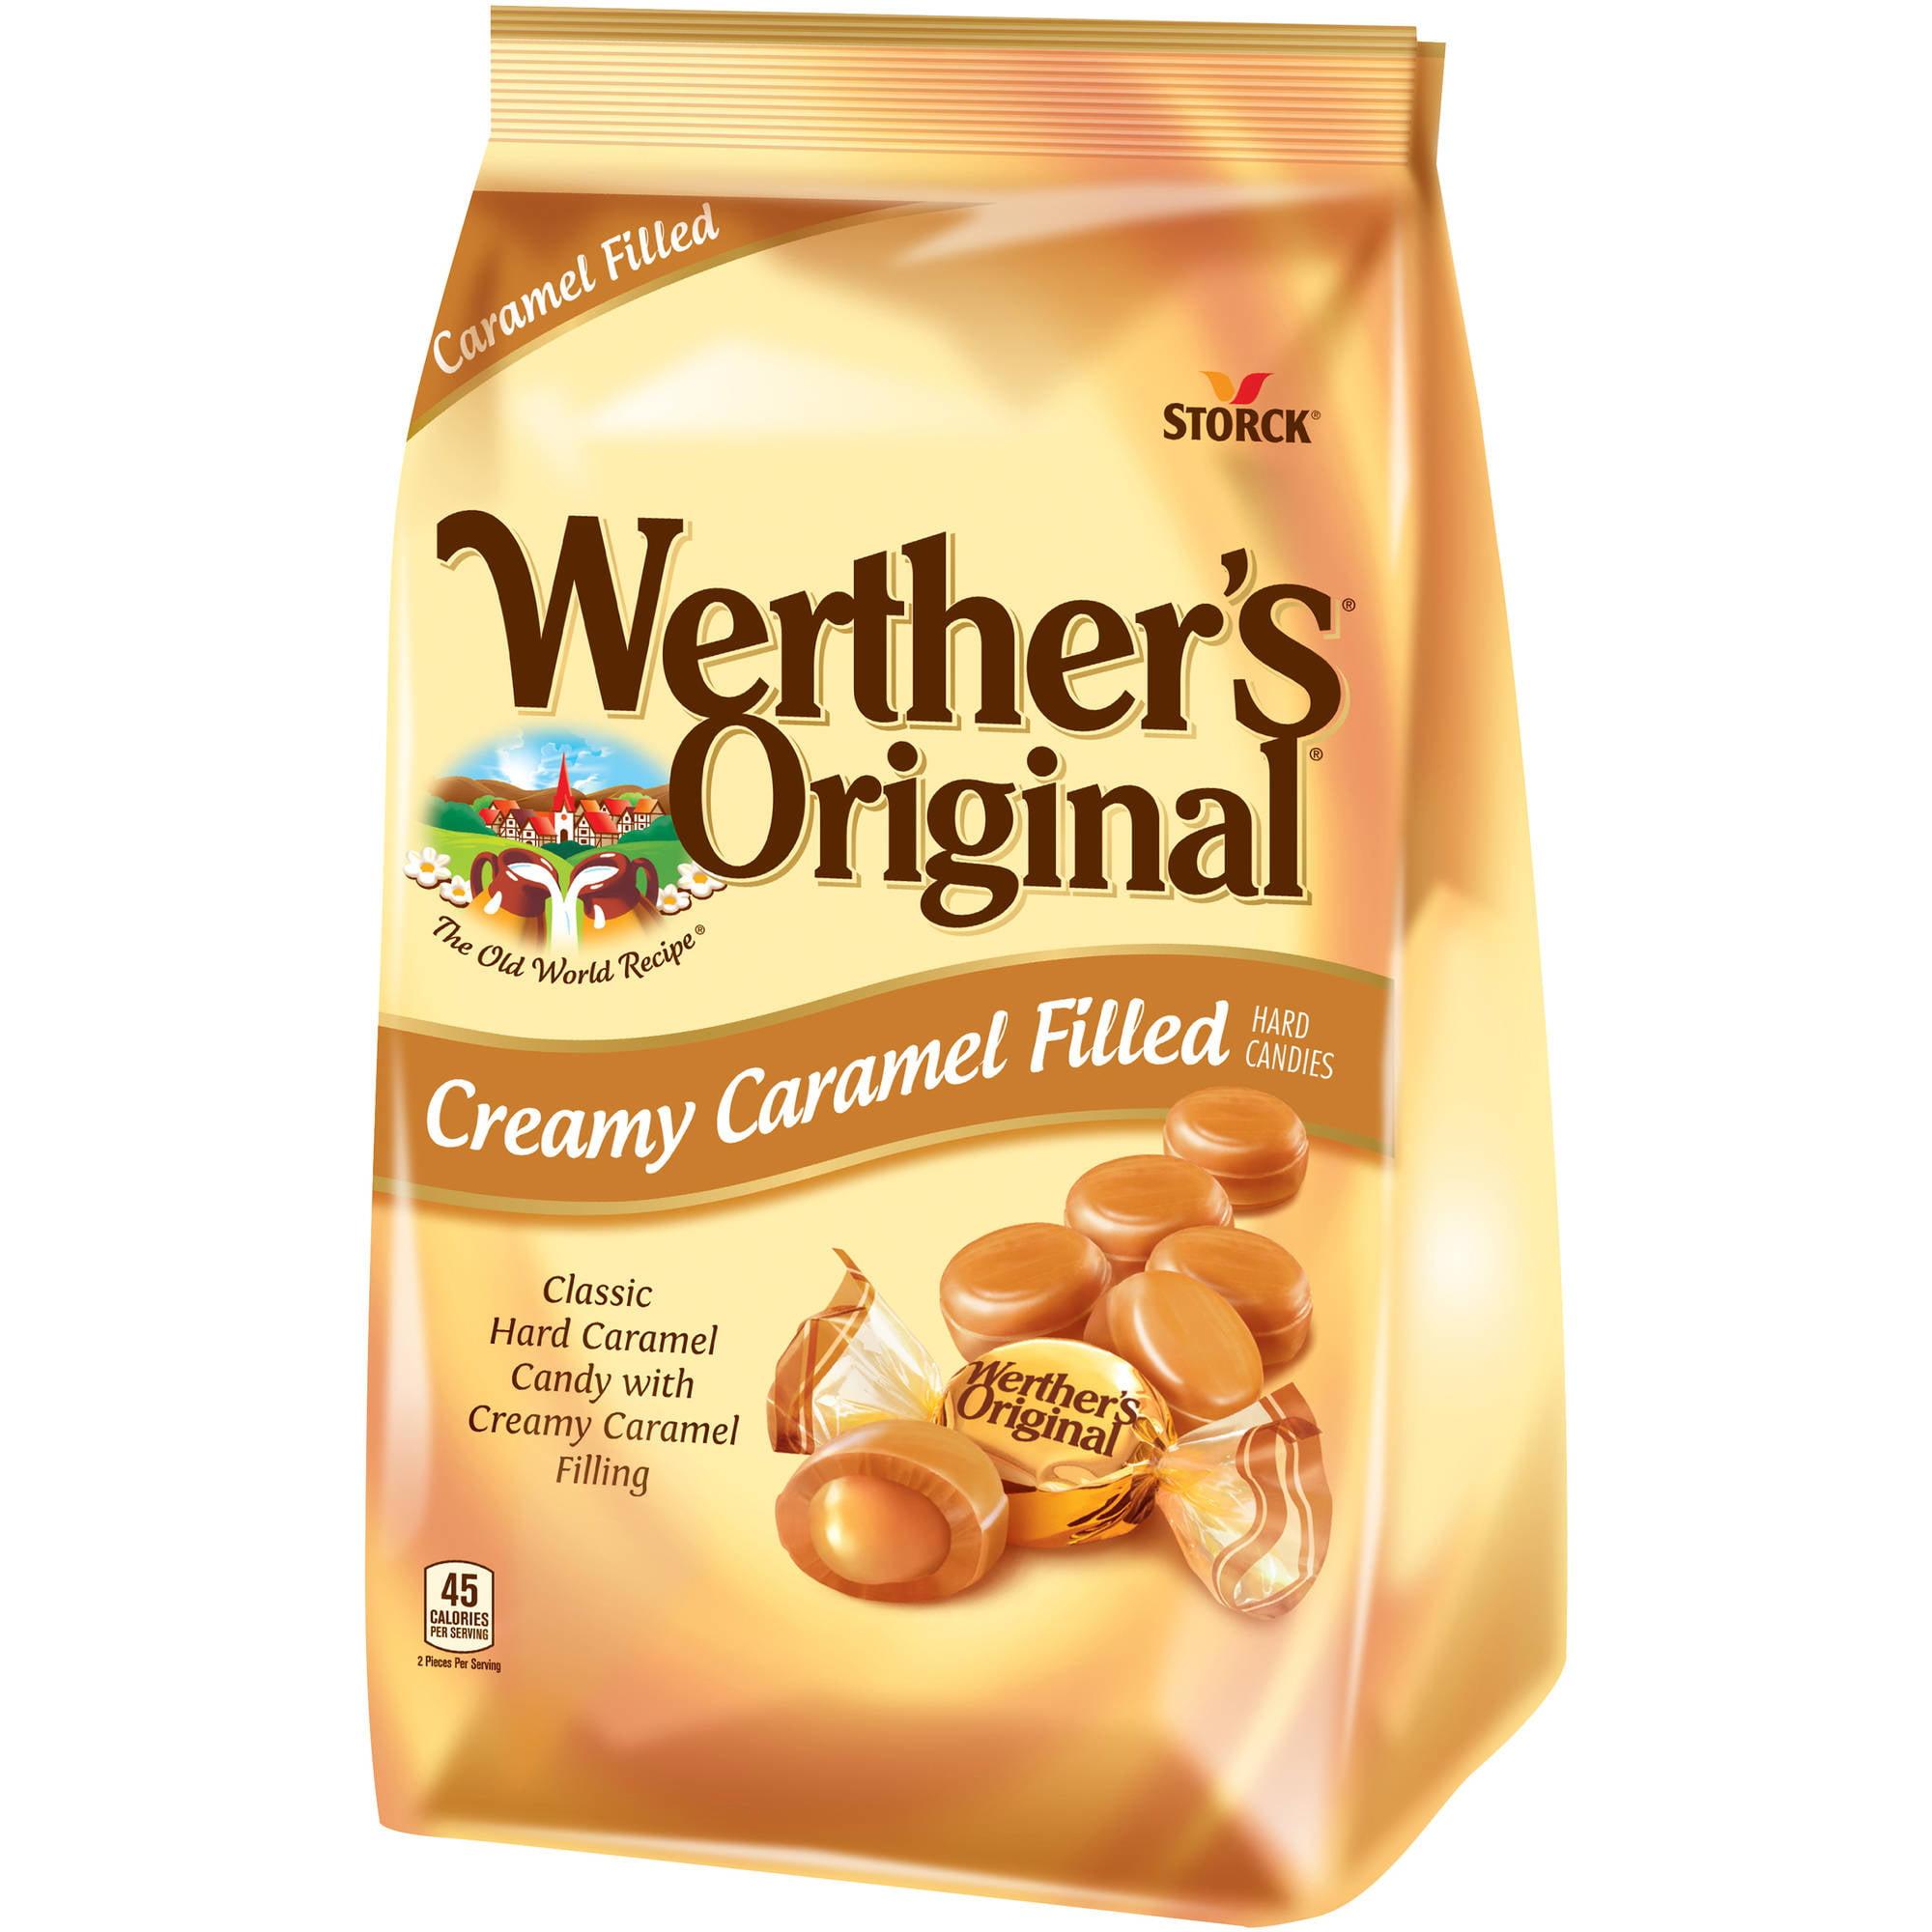 Werther's Original Creamy Caramel Filled Hard Candies, 30 oz